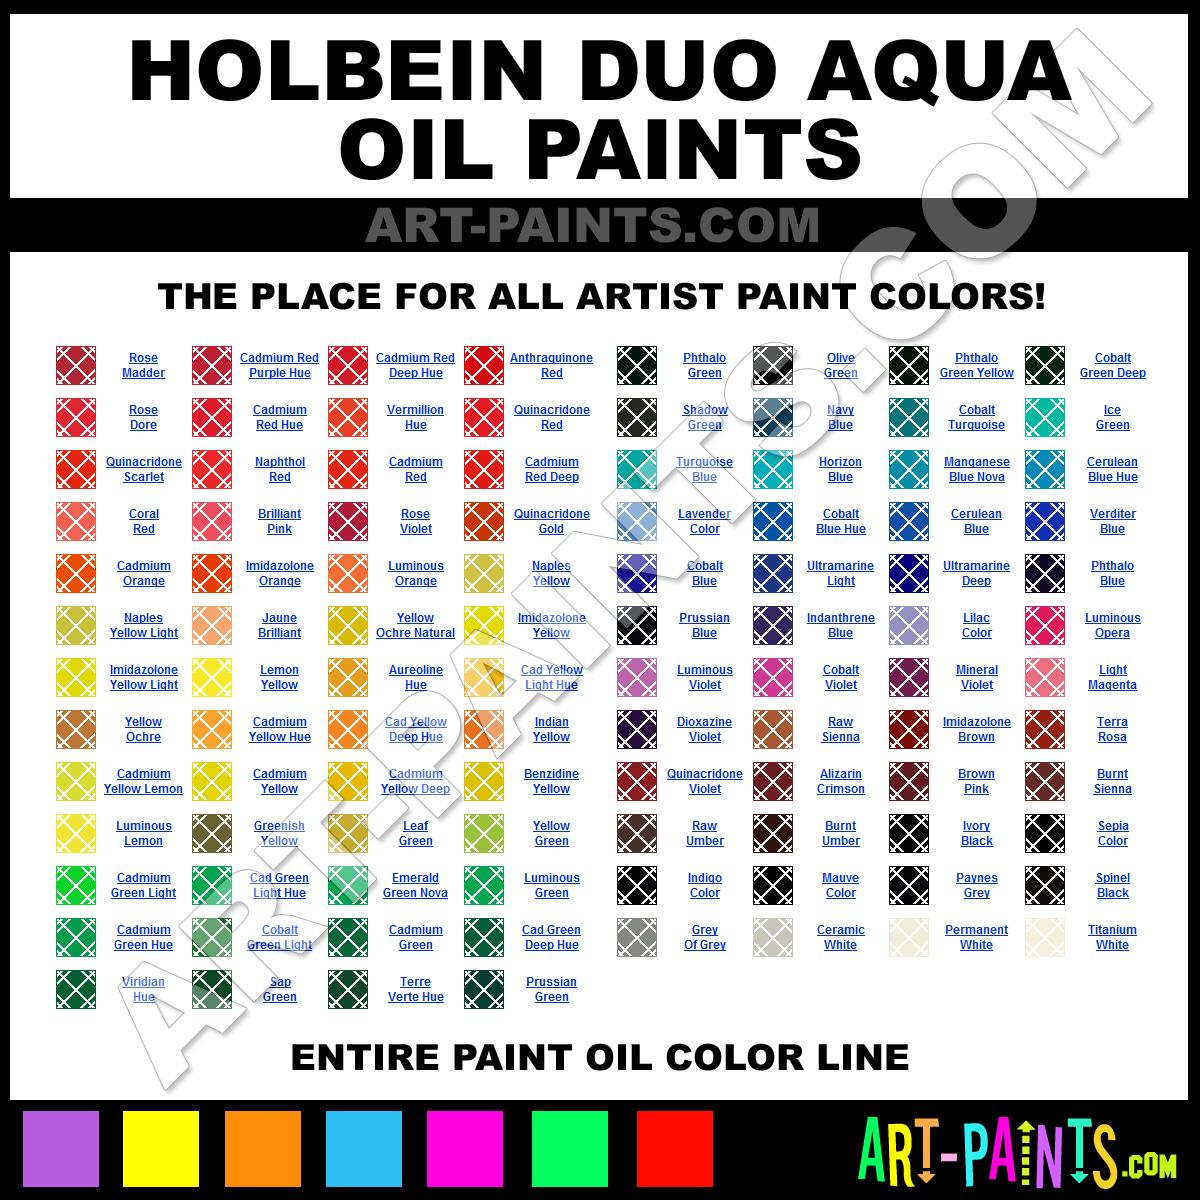 Holbein Duo Aqua Color Chart Holbein Duo Aqua